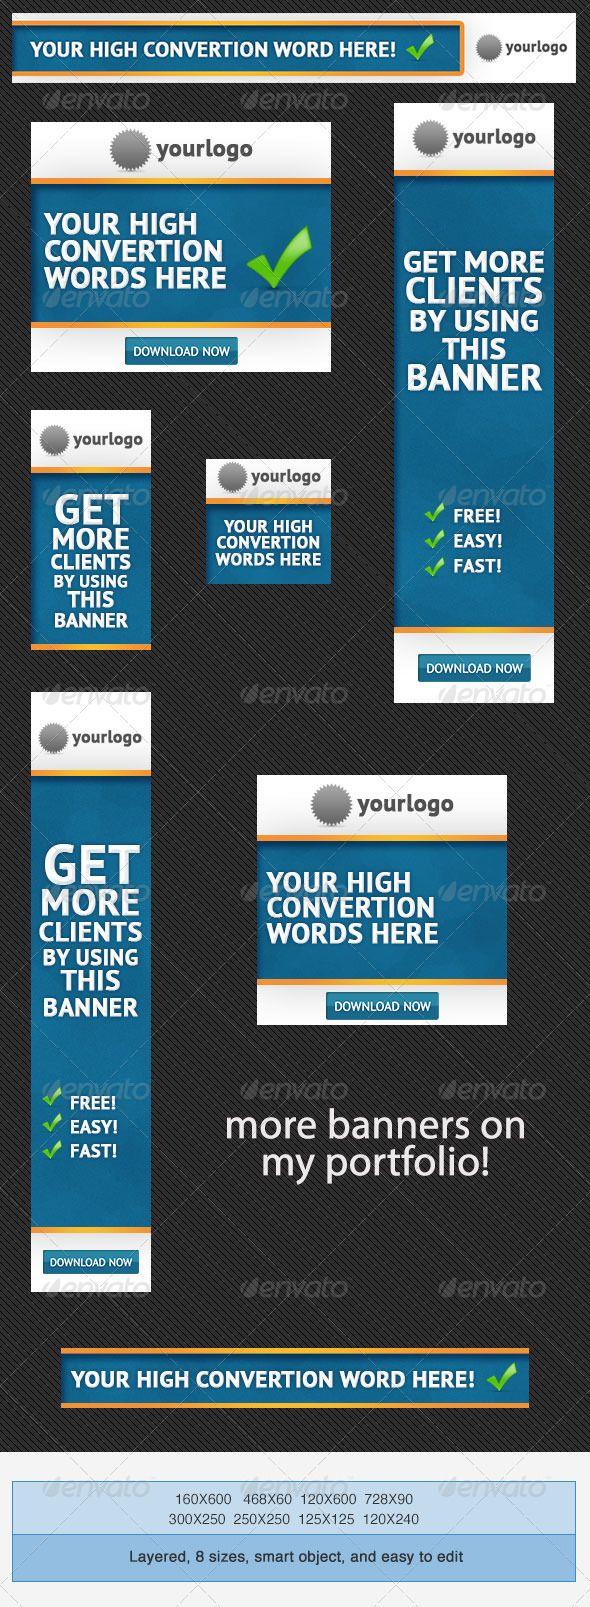 23 best Web Elements images on Pinterest | Font logo, Banner ...